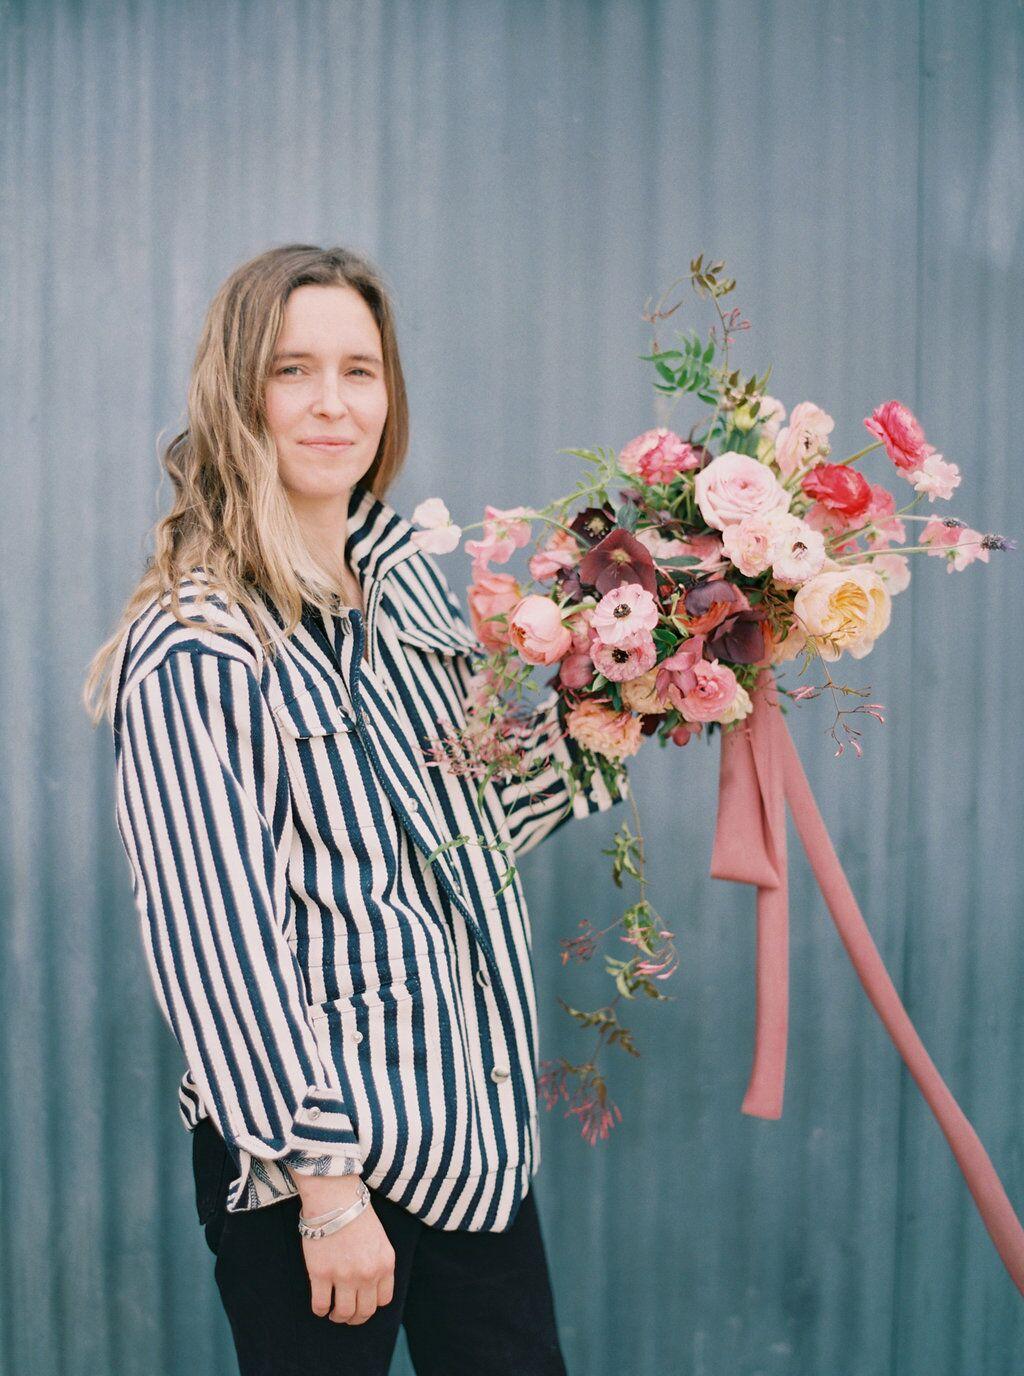 trynhphoto-sandiego-socal-florist-siren-floral-workshop-41_preview.jpg